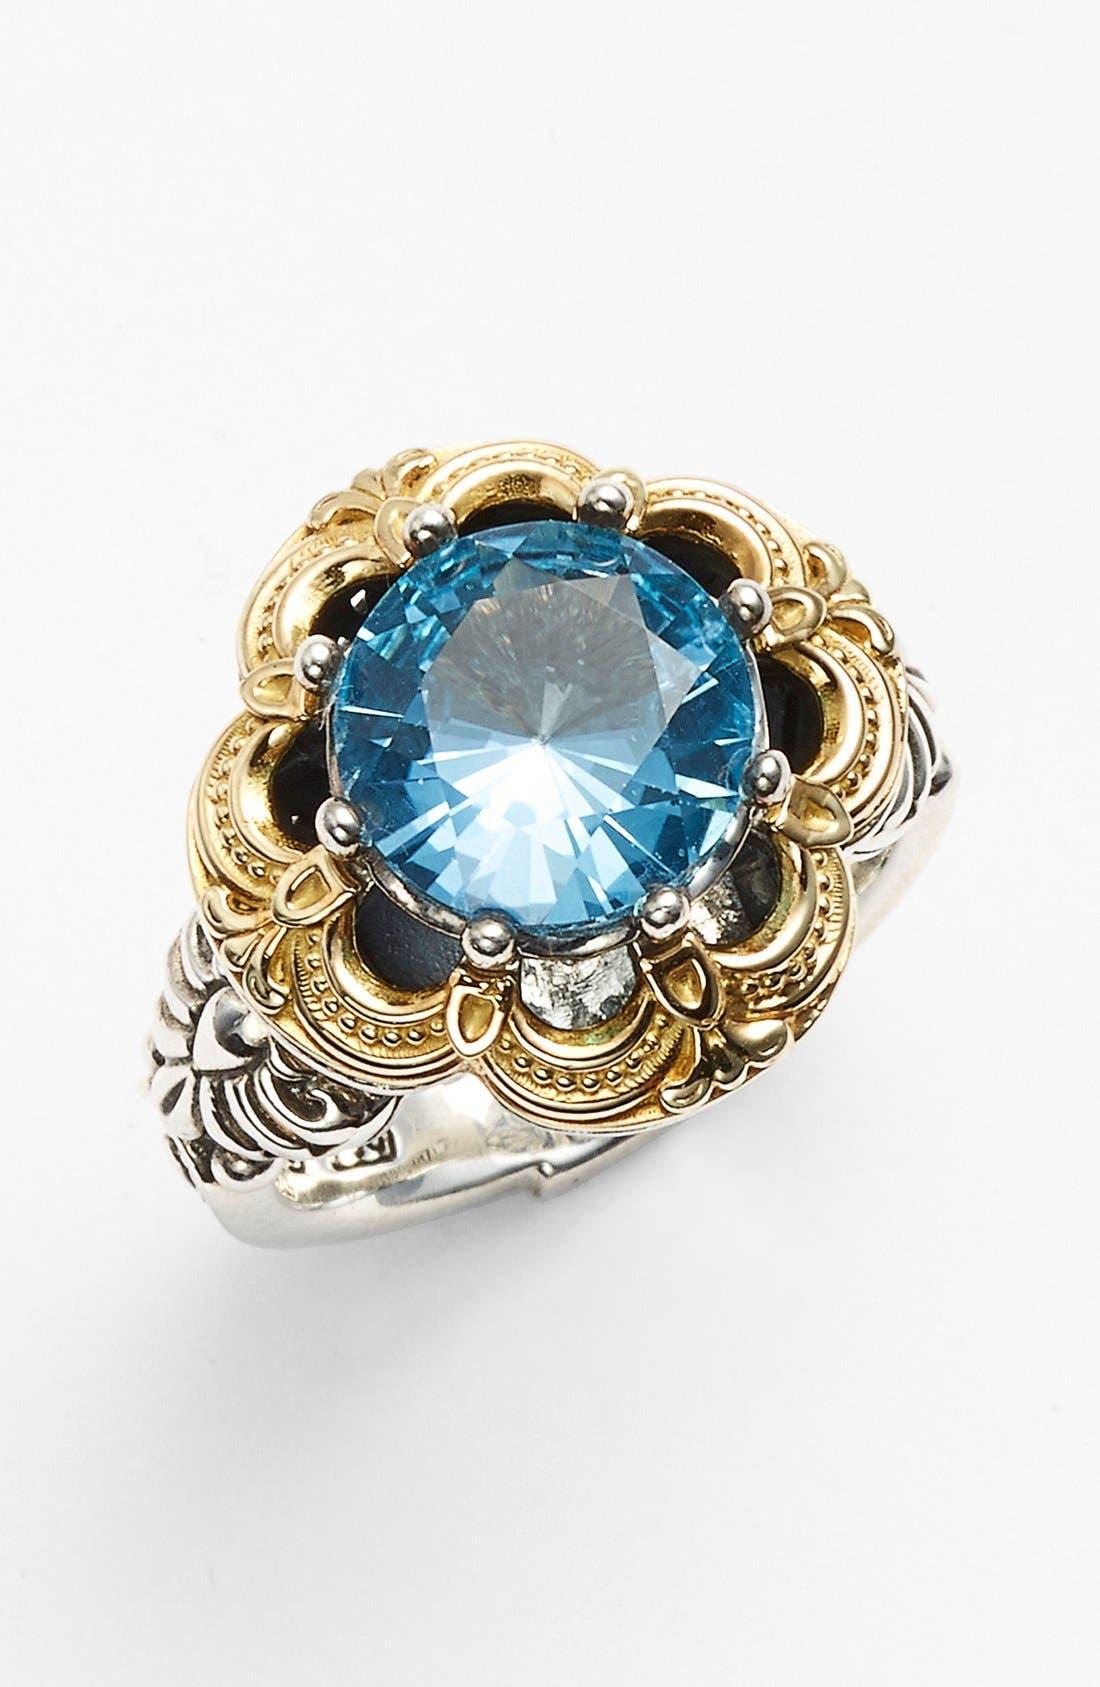 'Hermione' Semiprecious Stone Ring,                             Main thumbnail 1, color,                             Silver/ Blue Topaz